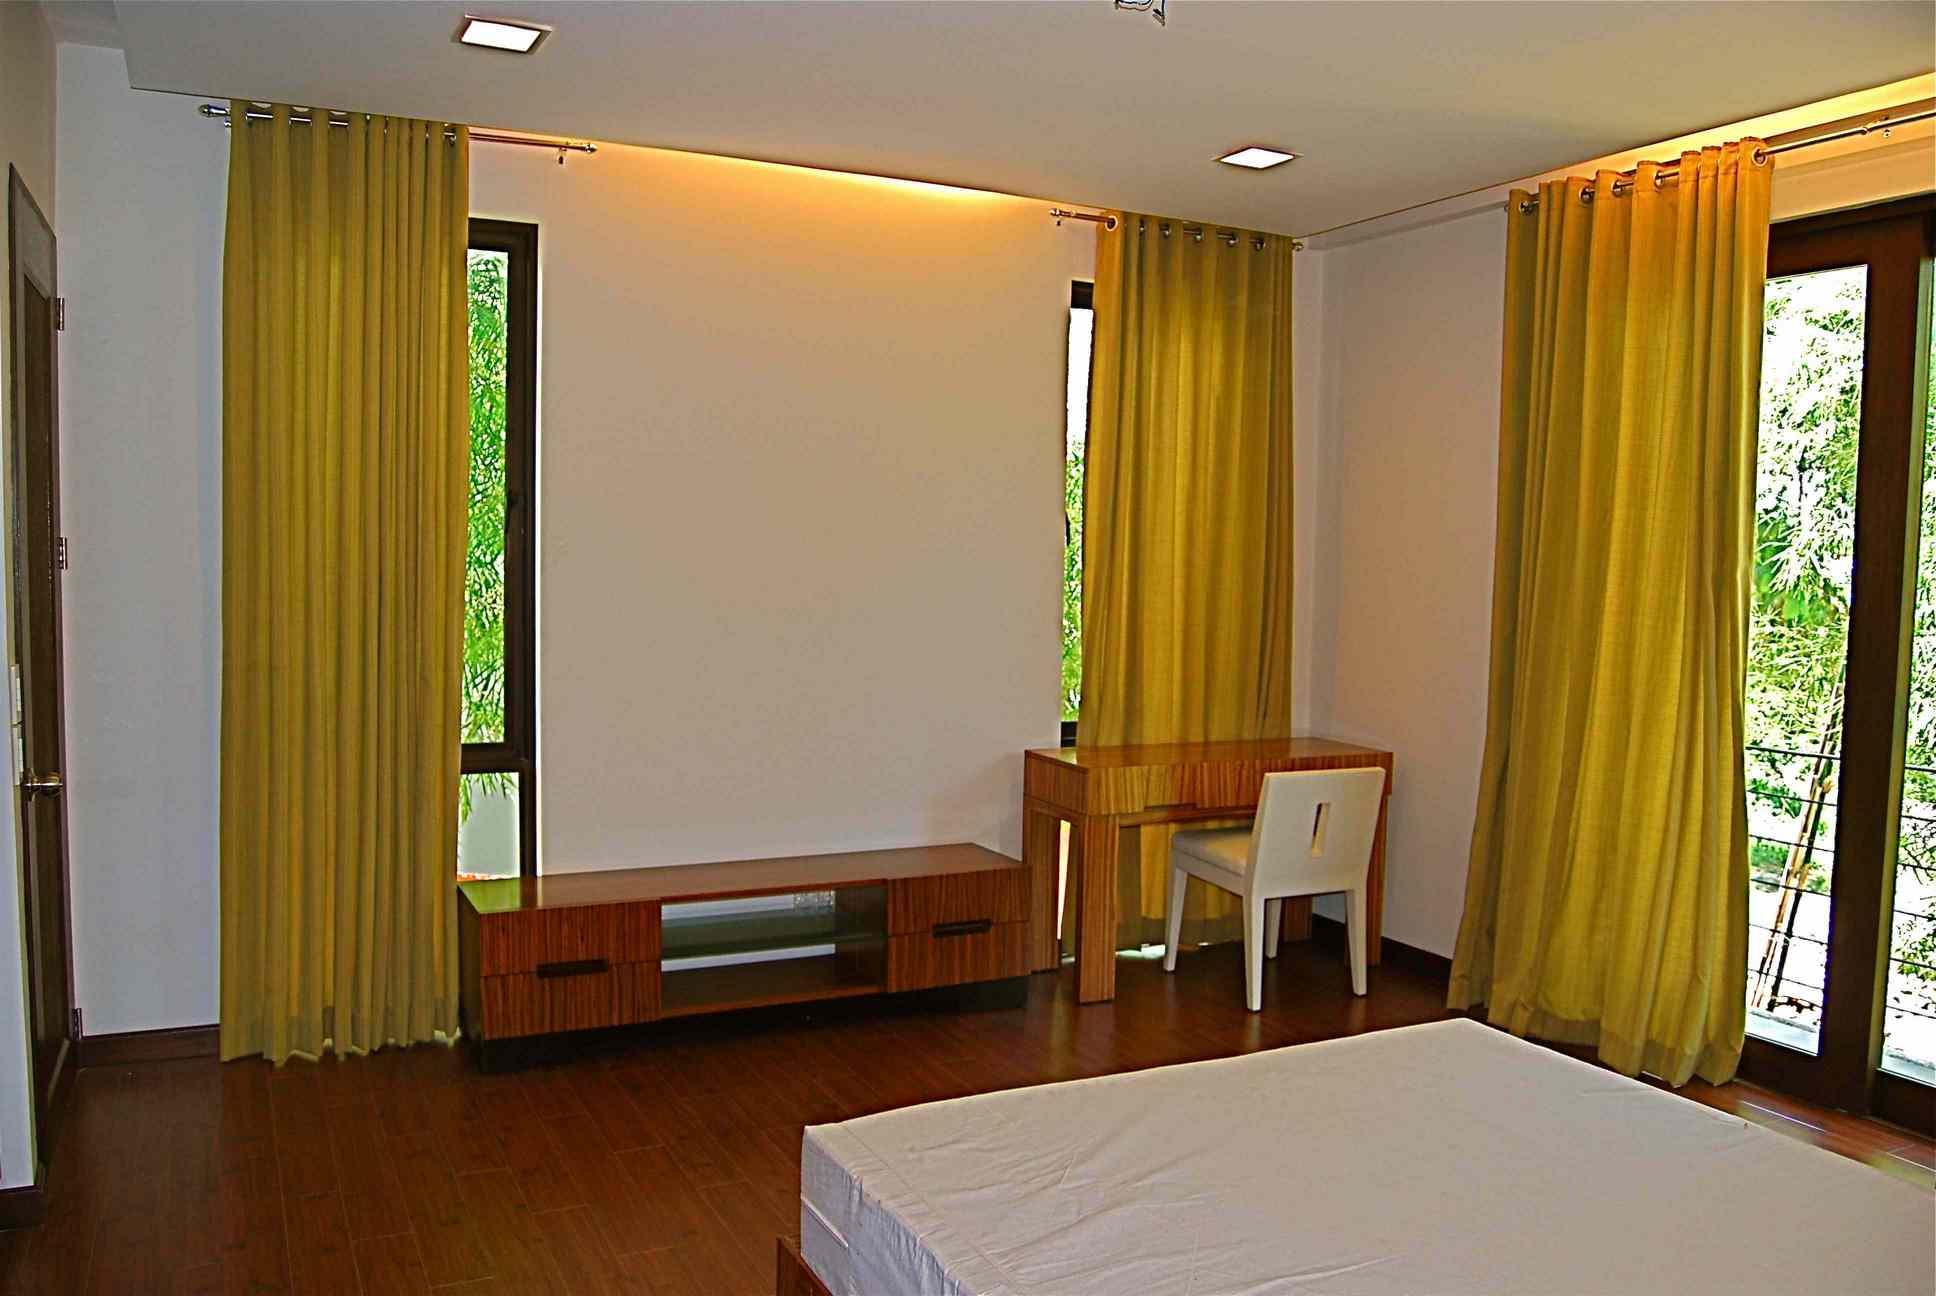 RH162 3 Bedroom House for Rent in Cebu City Banilad Cebu Grand Realty   4. House for Rent in Cebu City Banilad   Cebu Grand Realty